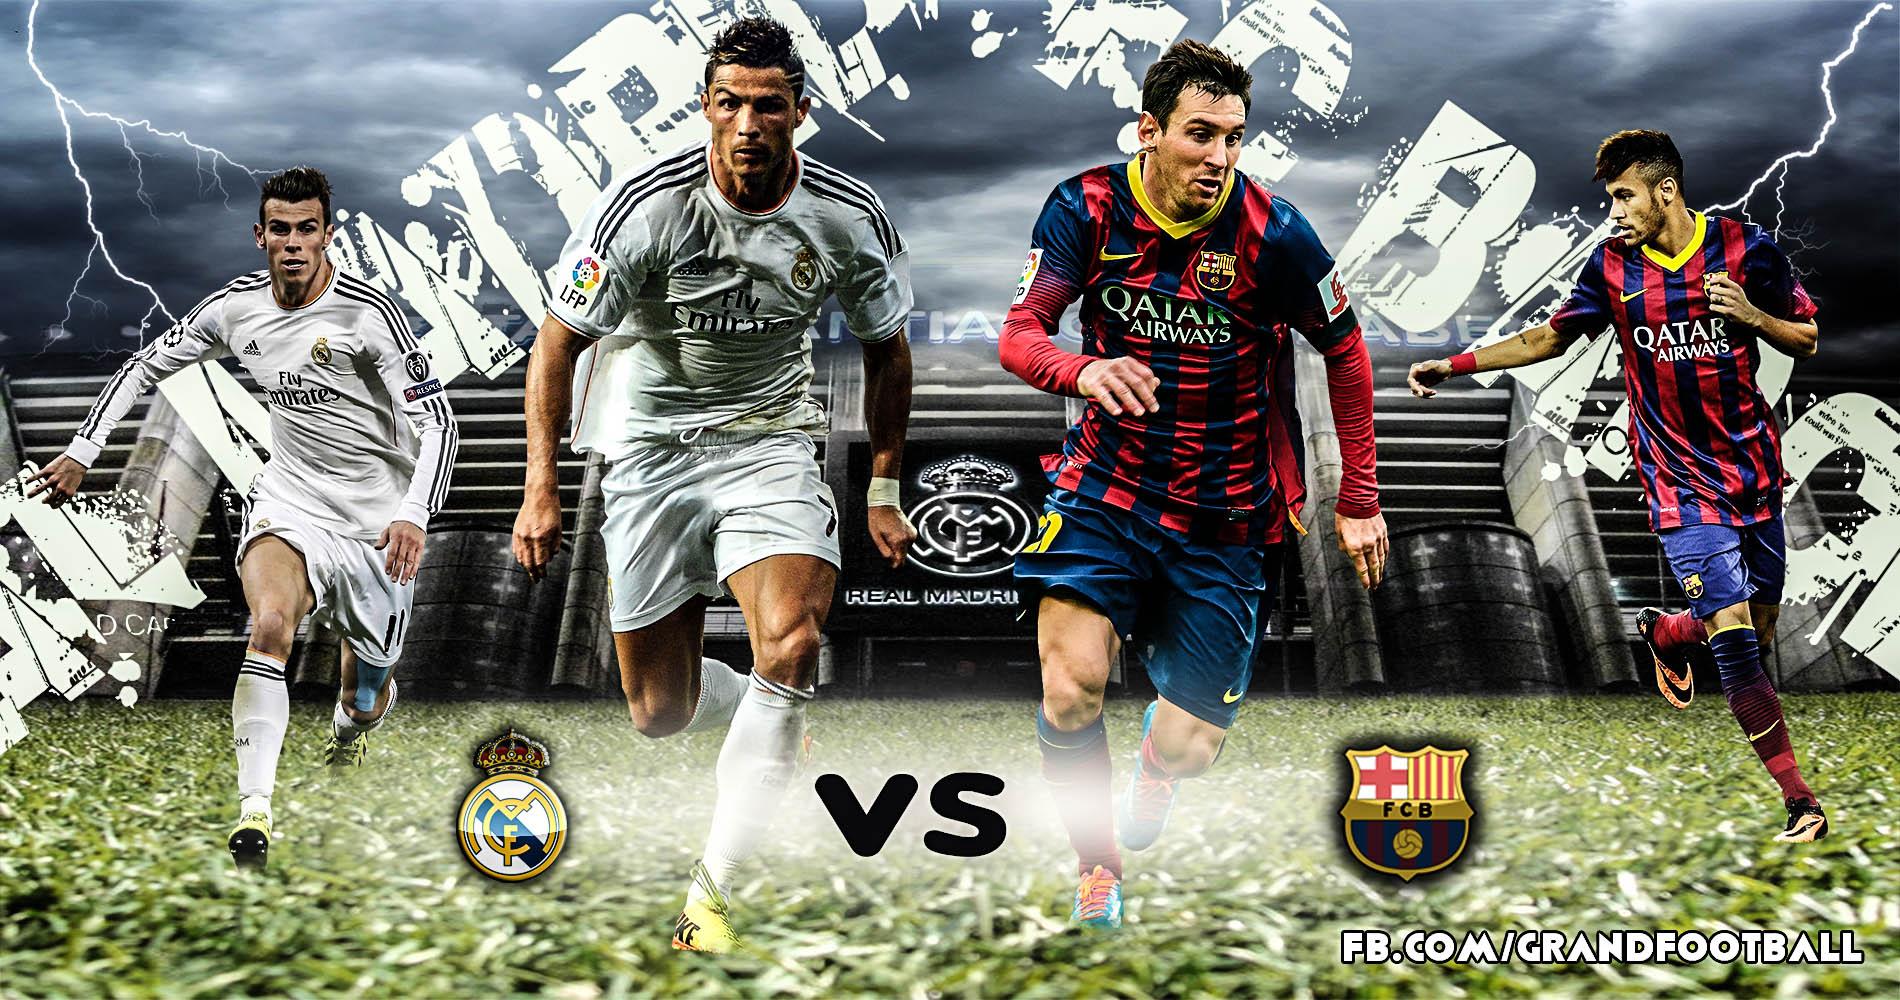 Barcelona Fc Vs Real Madrid